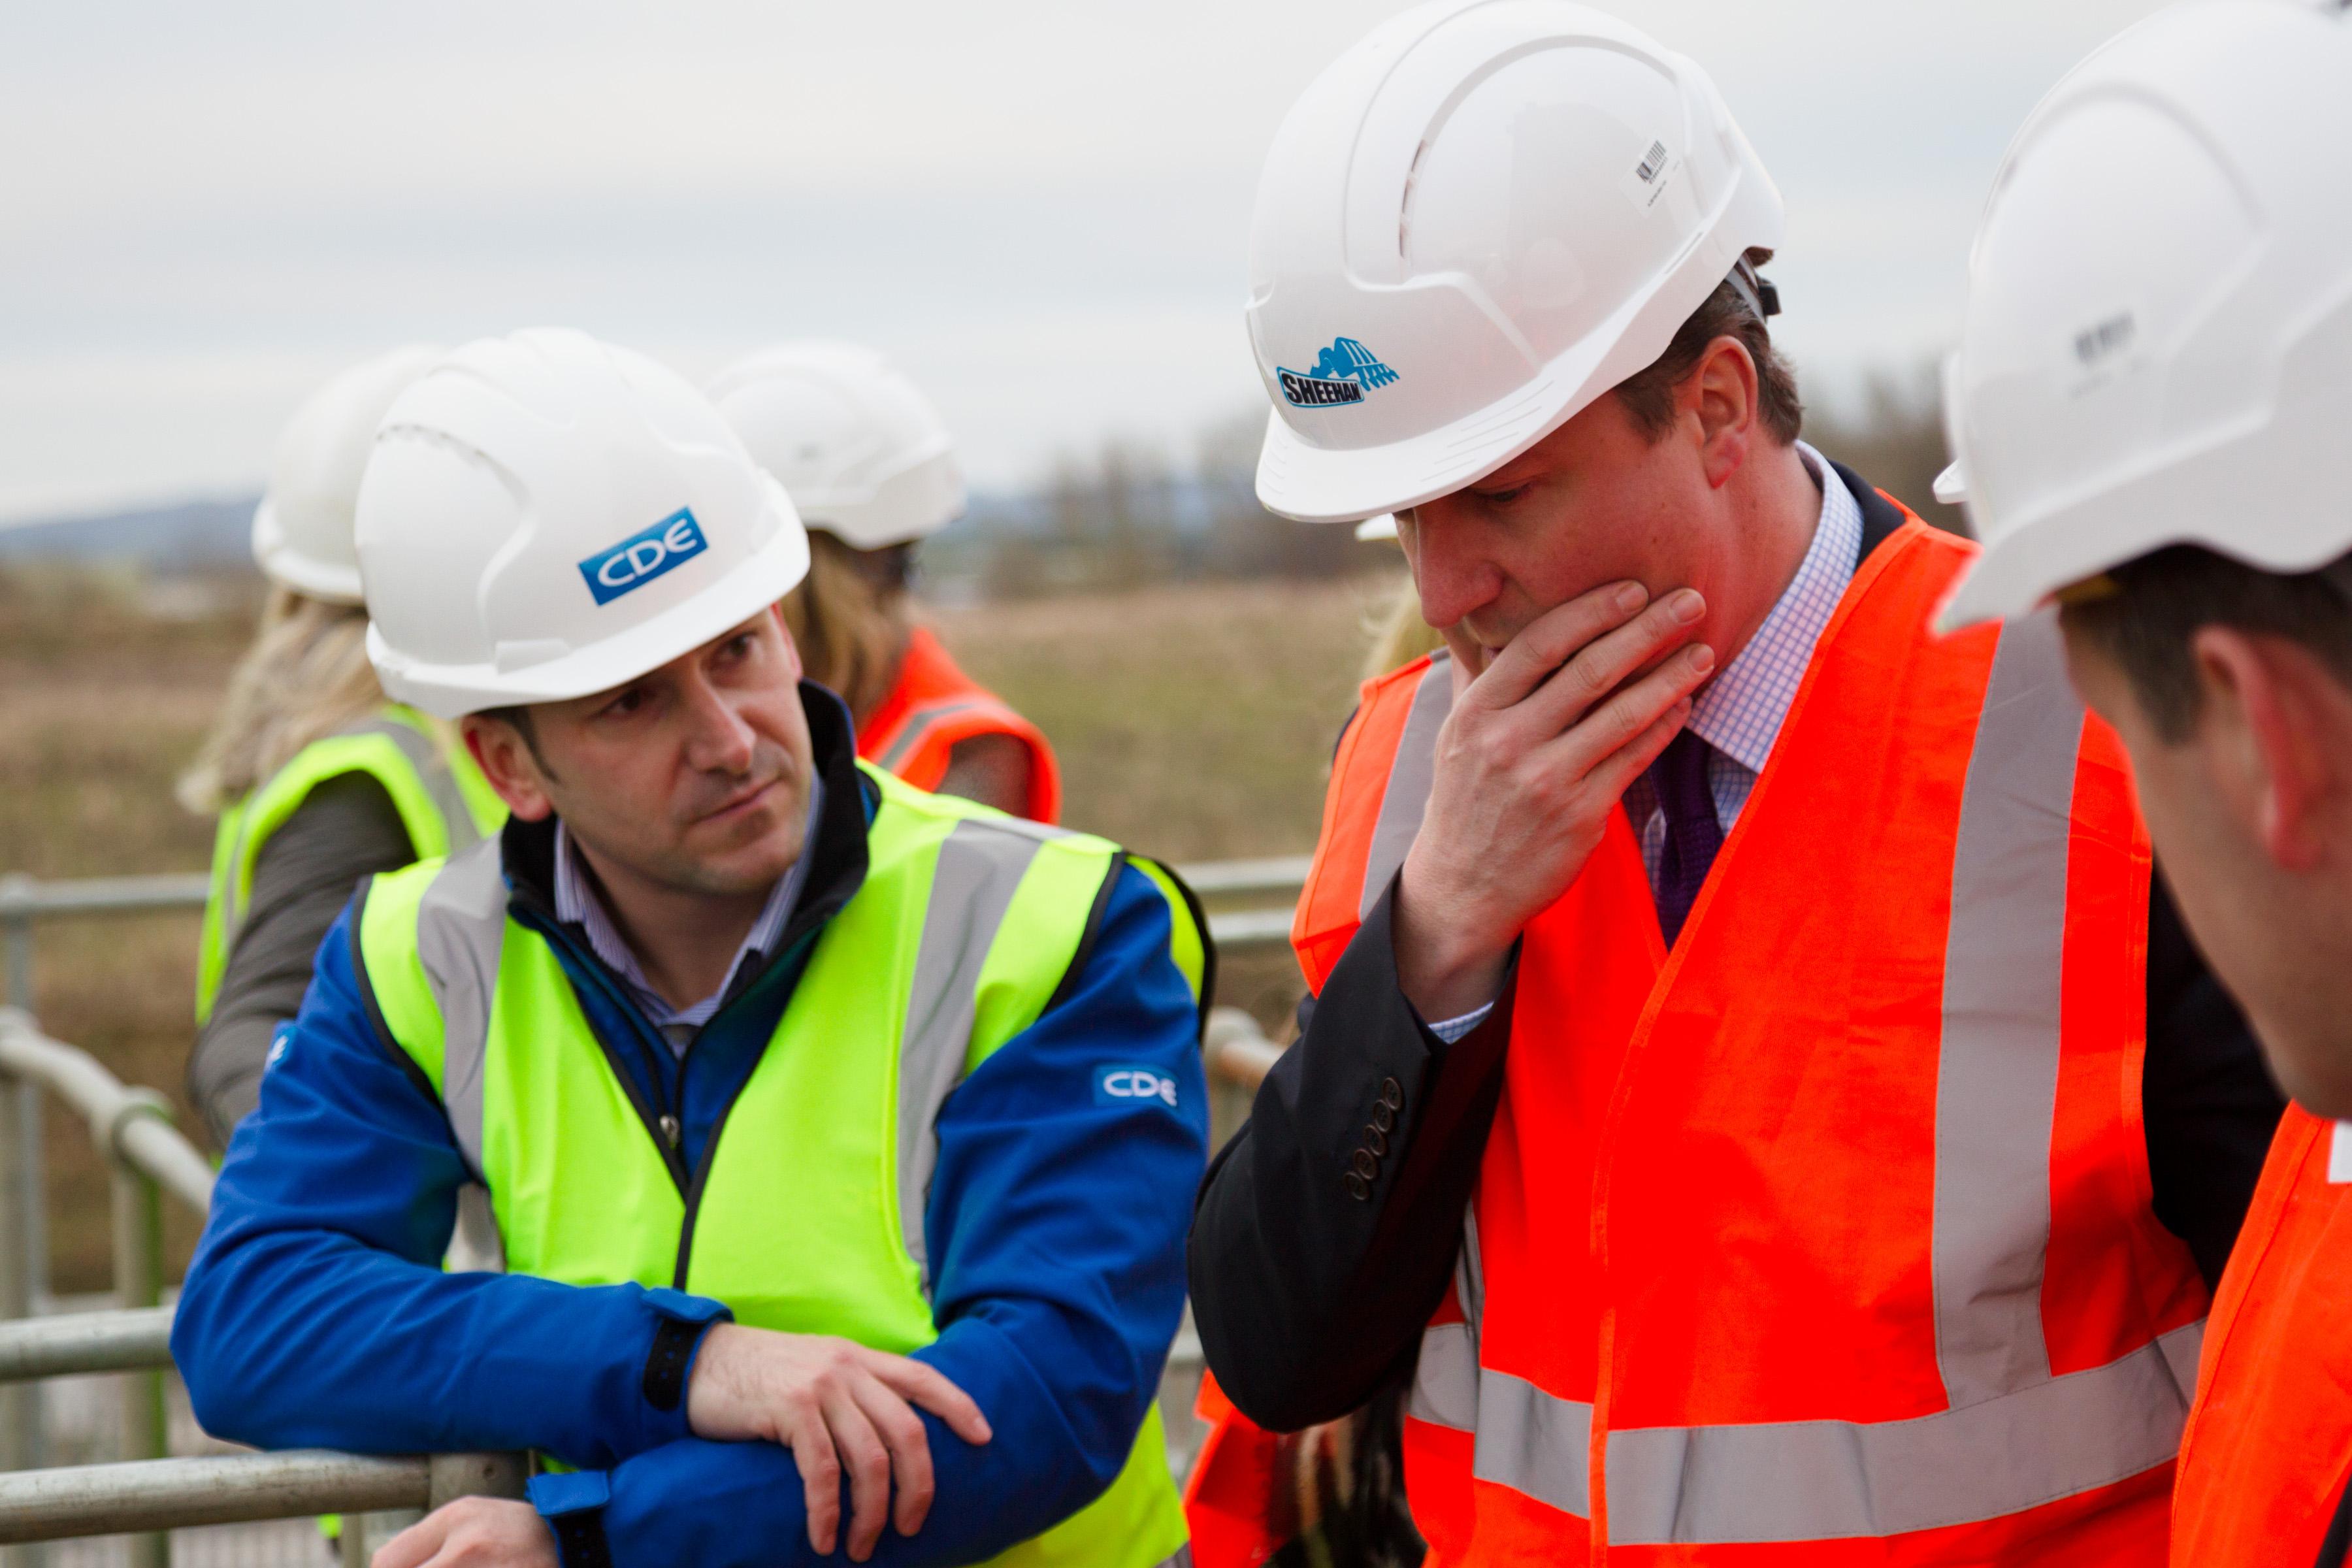 Brendan McGurgan and David Cameron